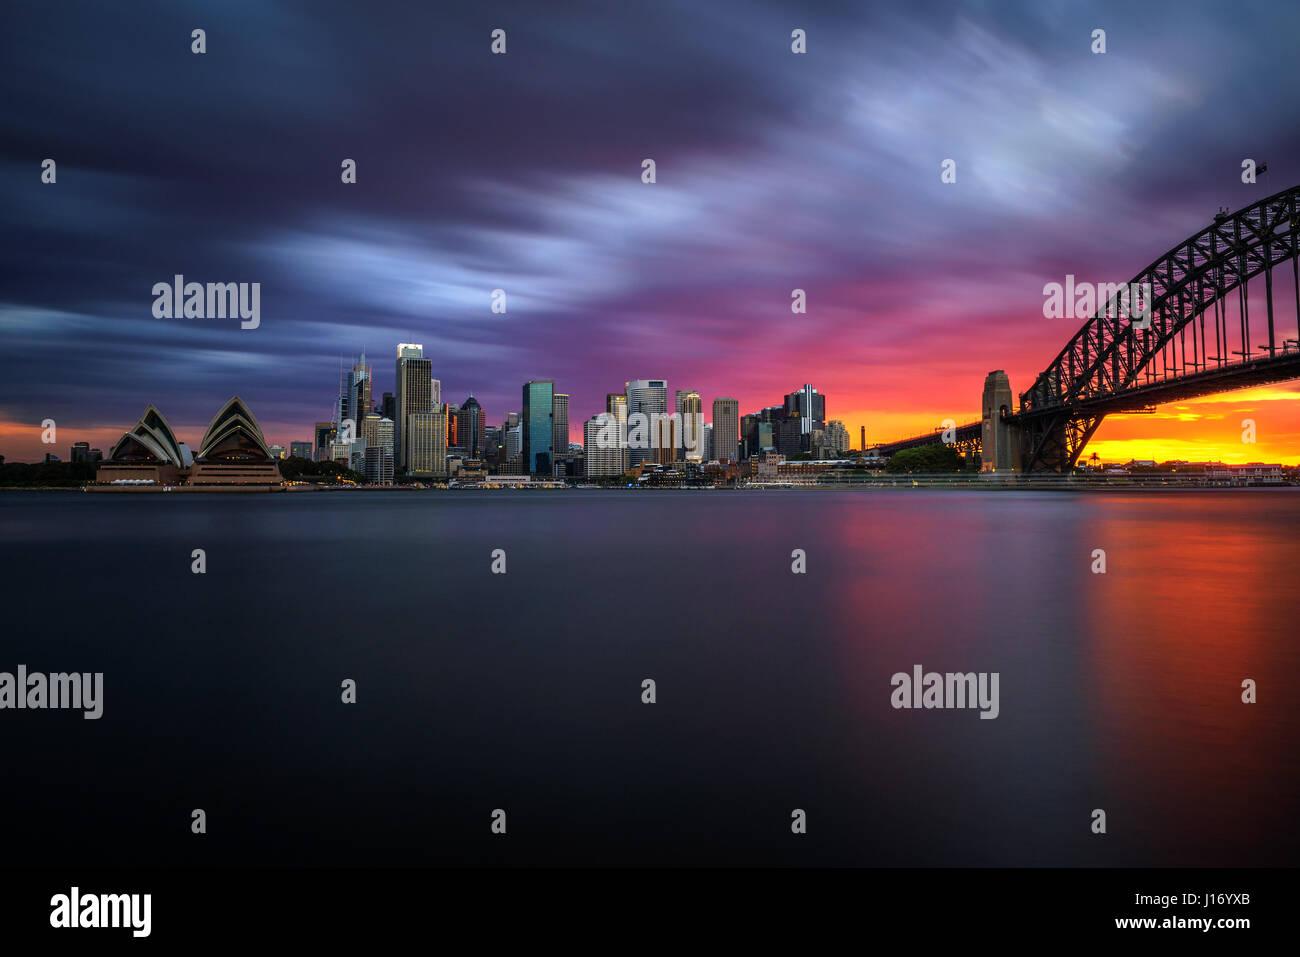 Sunset skyline del centro cittadino di Sydney Harbour Bridge, NSW, Australia. Lunga esposizione. Immagini Stock